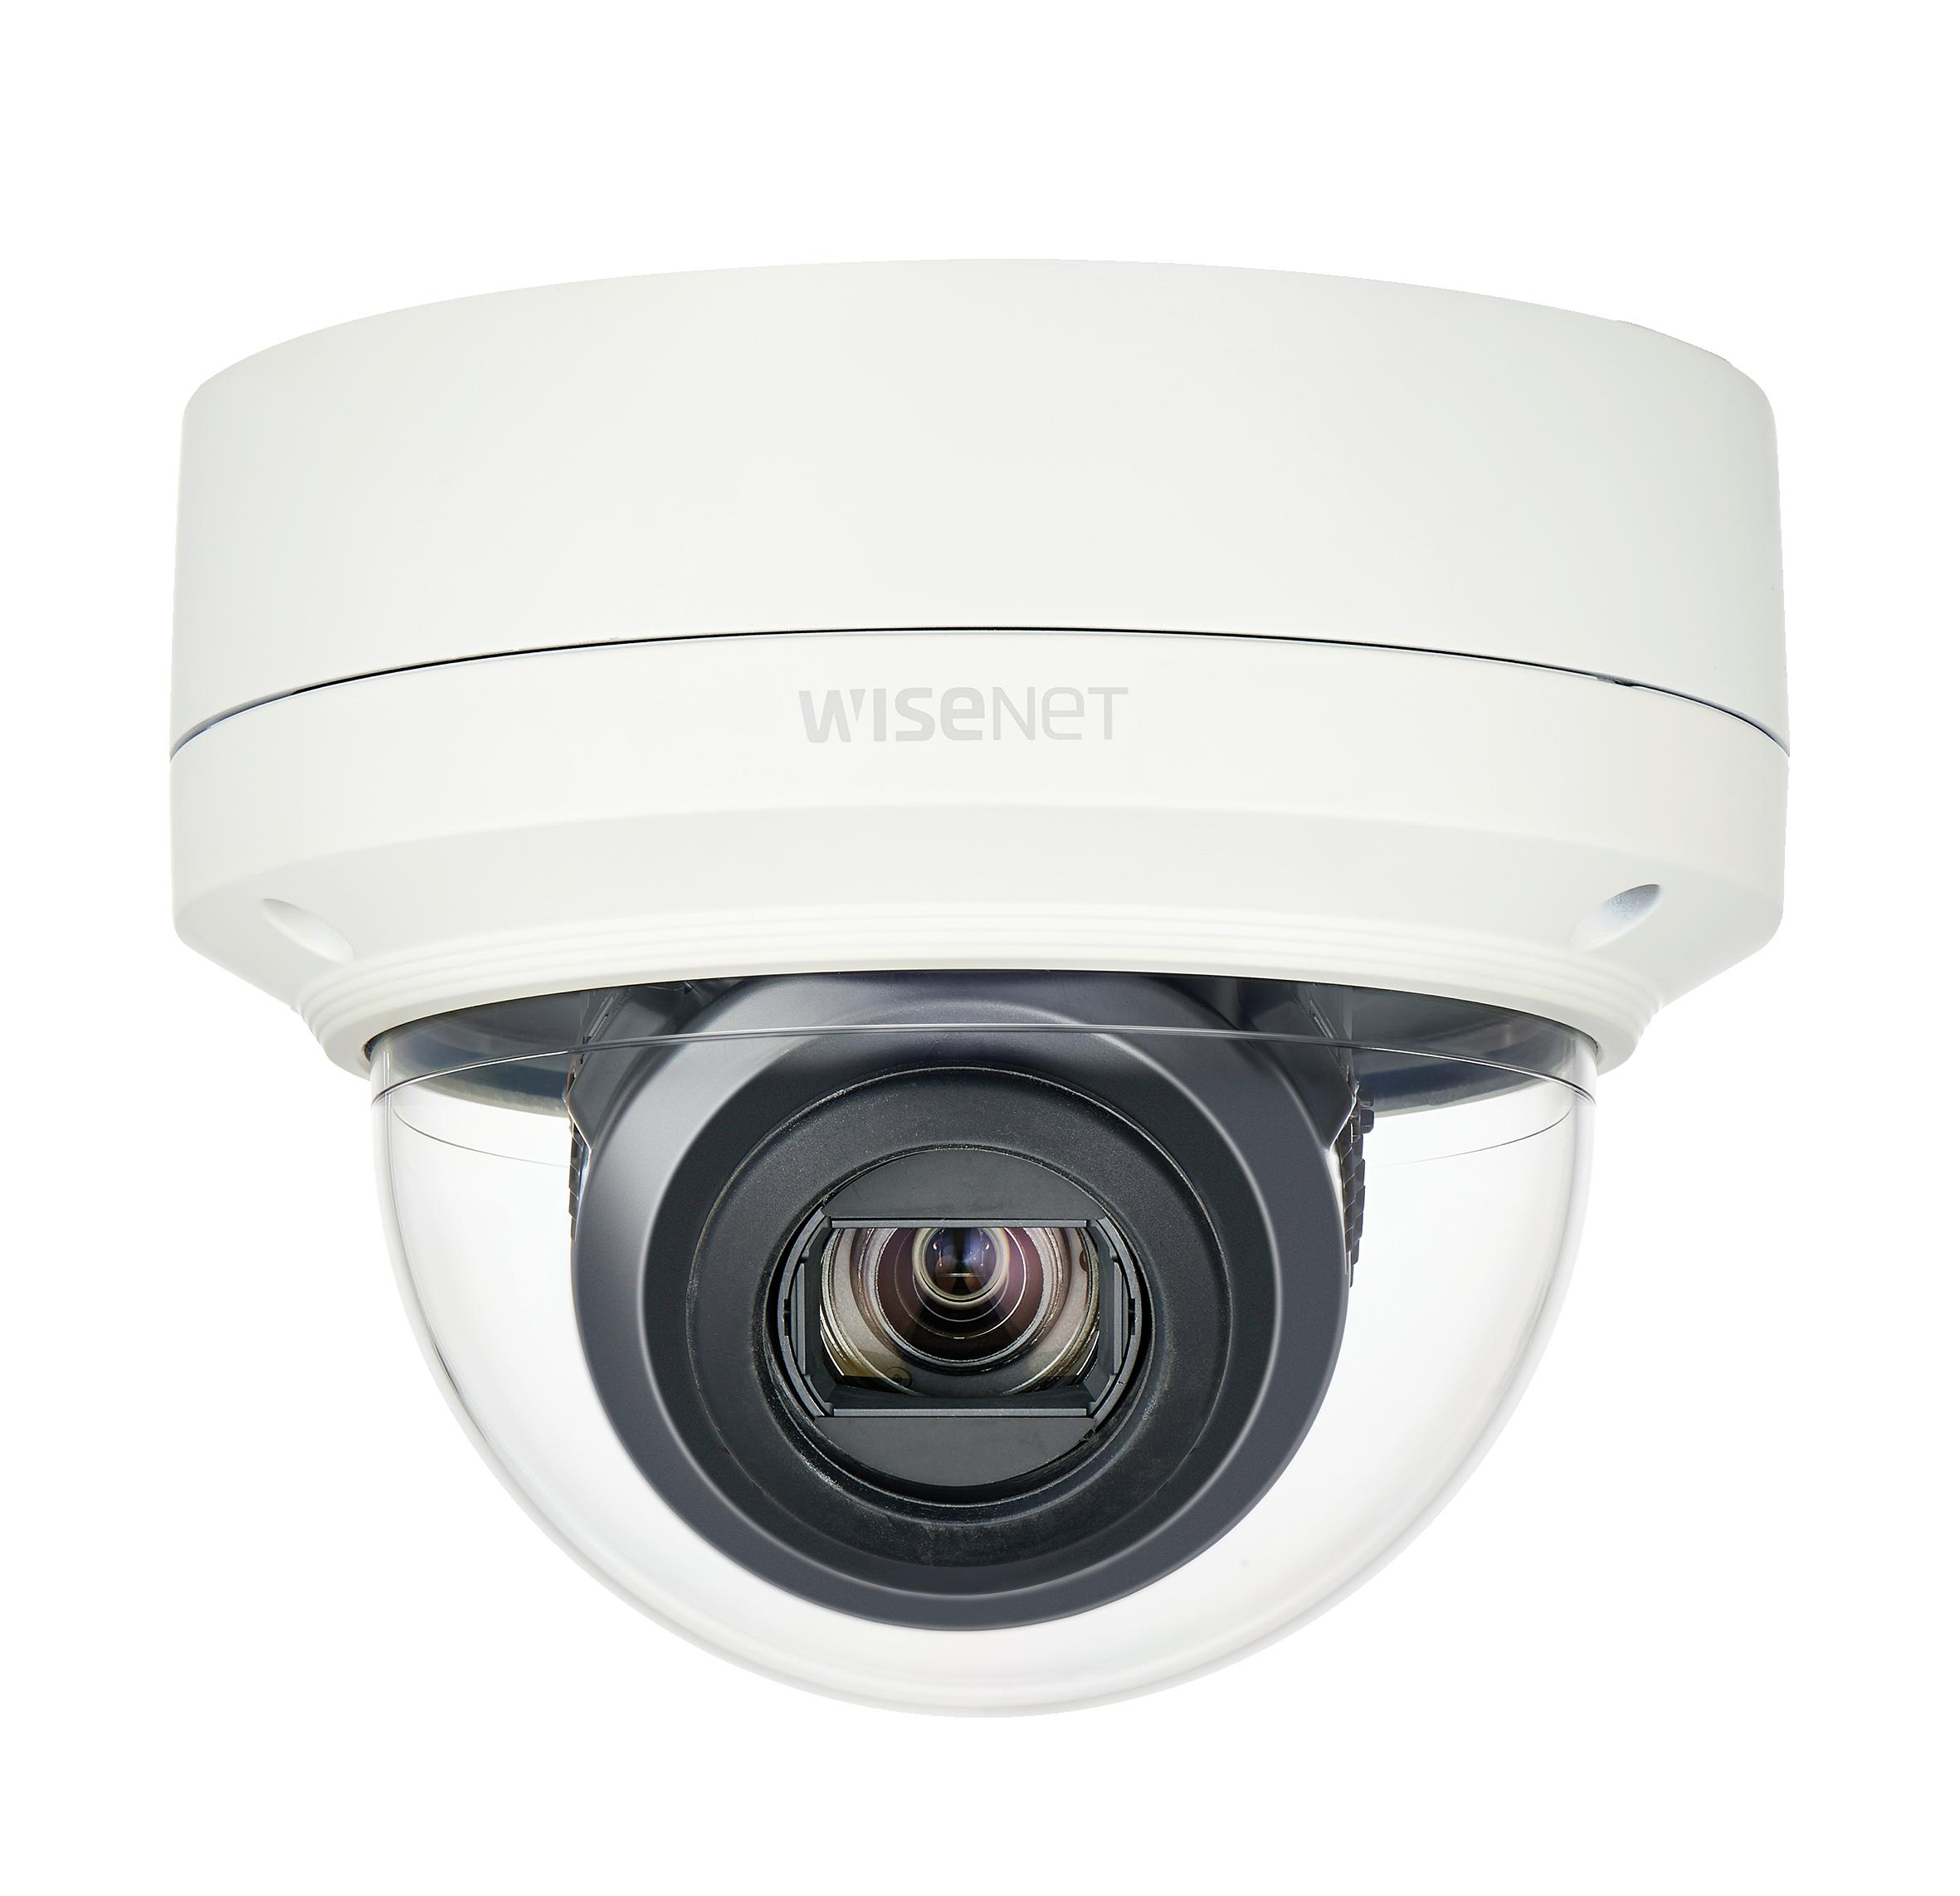 Kamera sieciowa IP 2MP kopułowa wandaloodporna